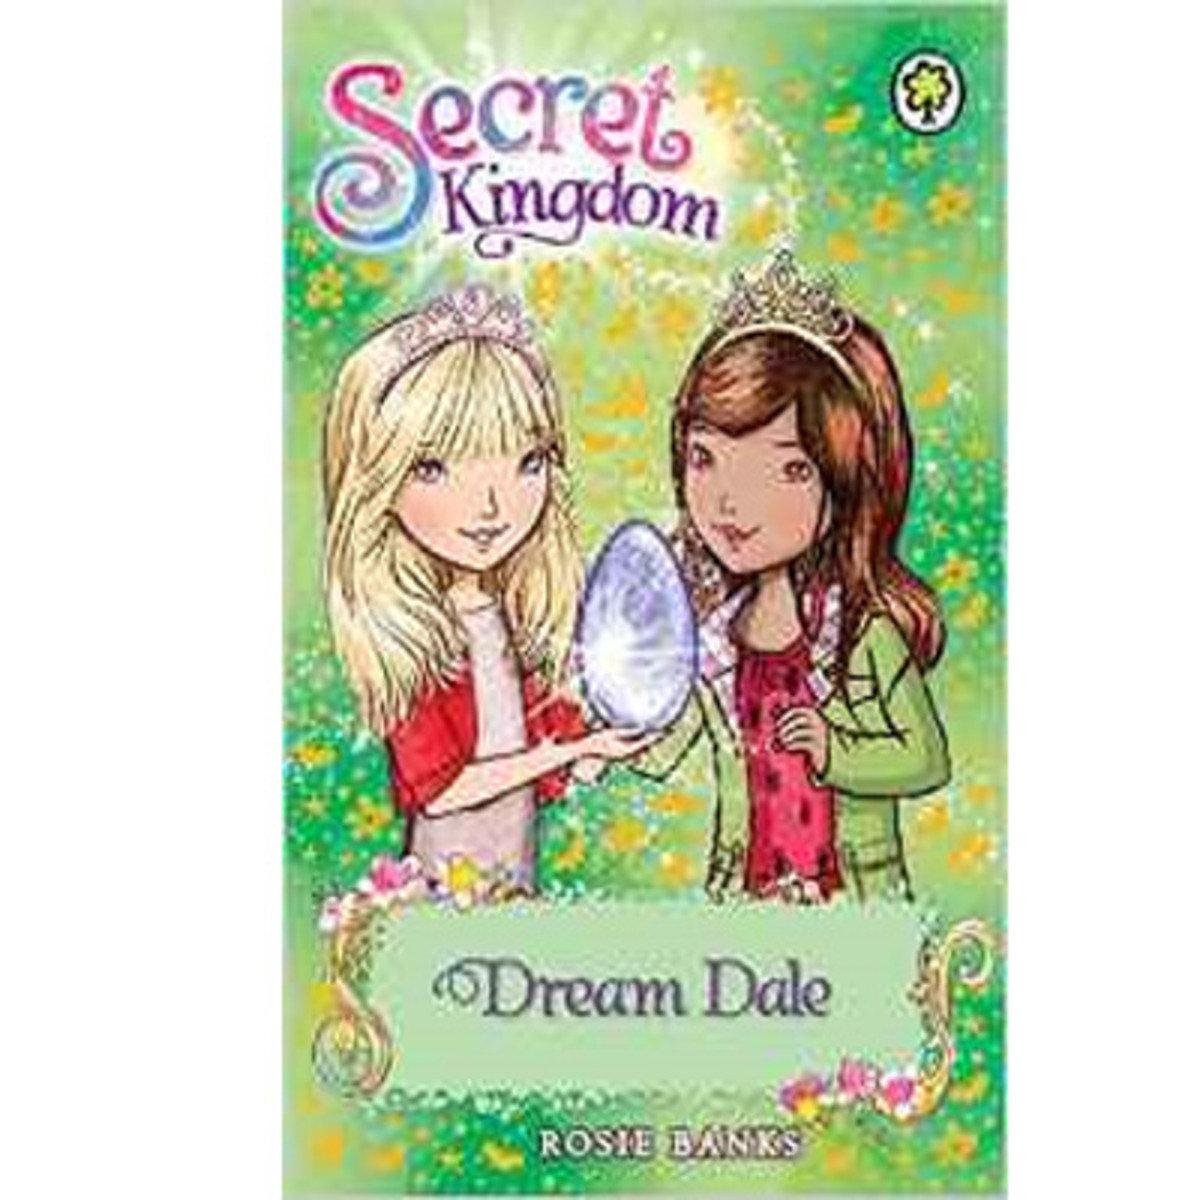 SECRET KINGDOM #9 DREAM DALE 9781408323786